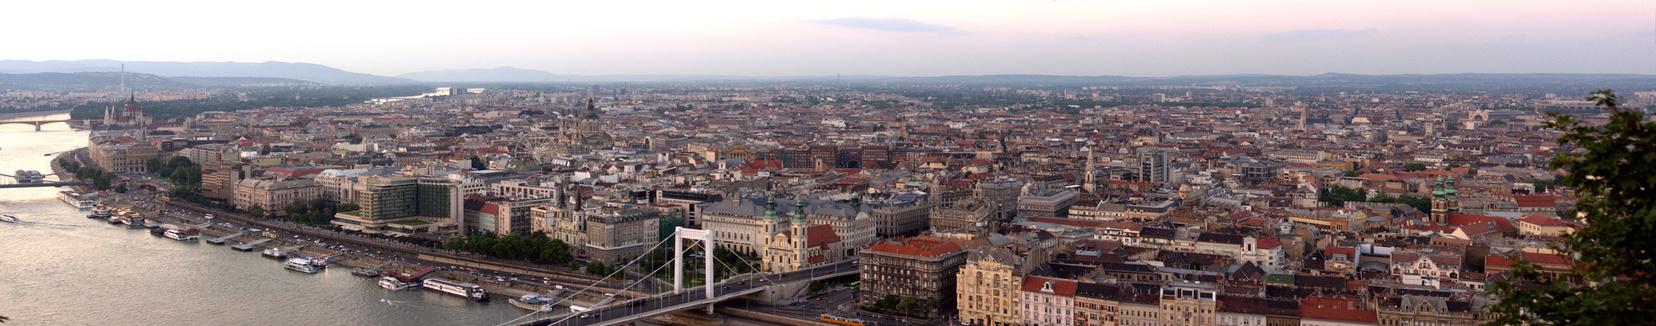 Budapest panorama interrail routen